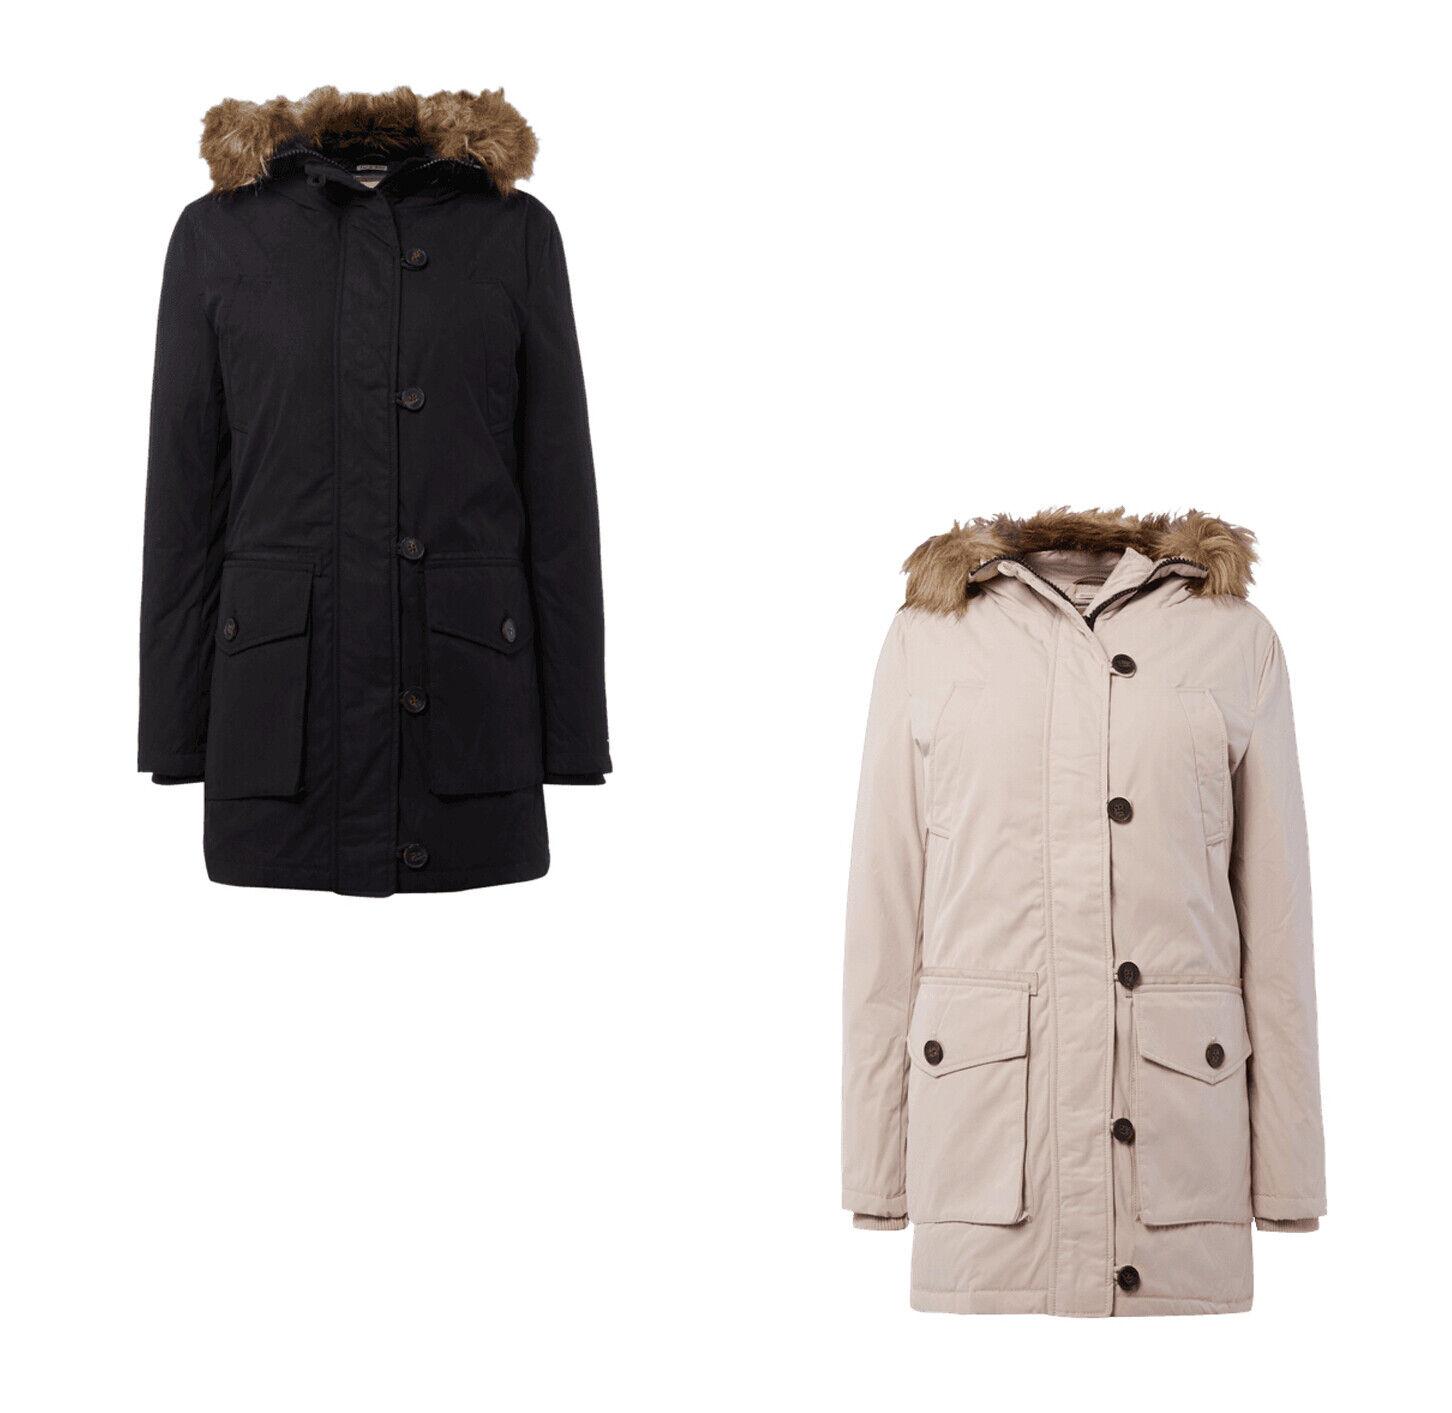 Hilfiger Denim Parka plumón-abrigo chaqueta capucha invierno chaqueta señora  talla s  bienvenido a orden